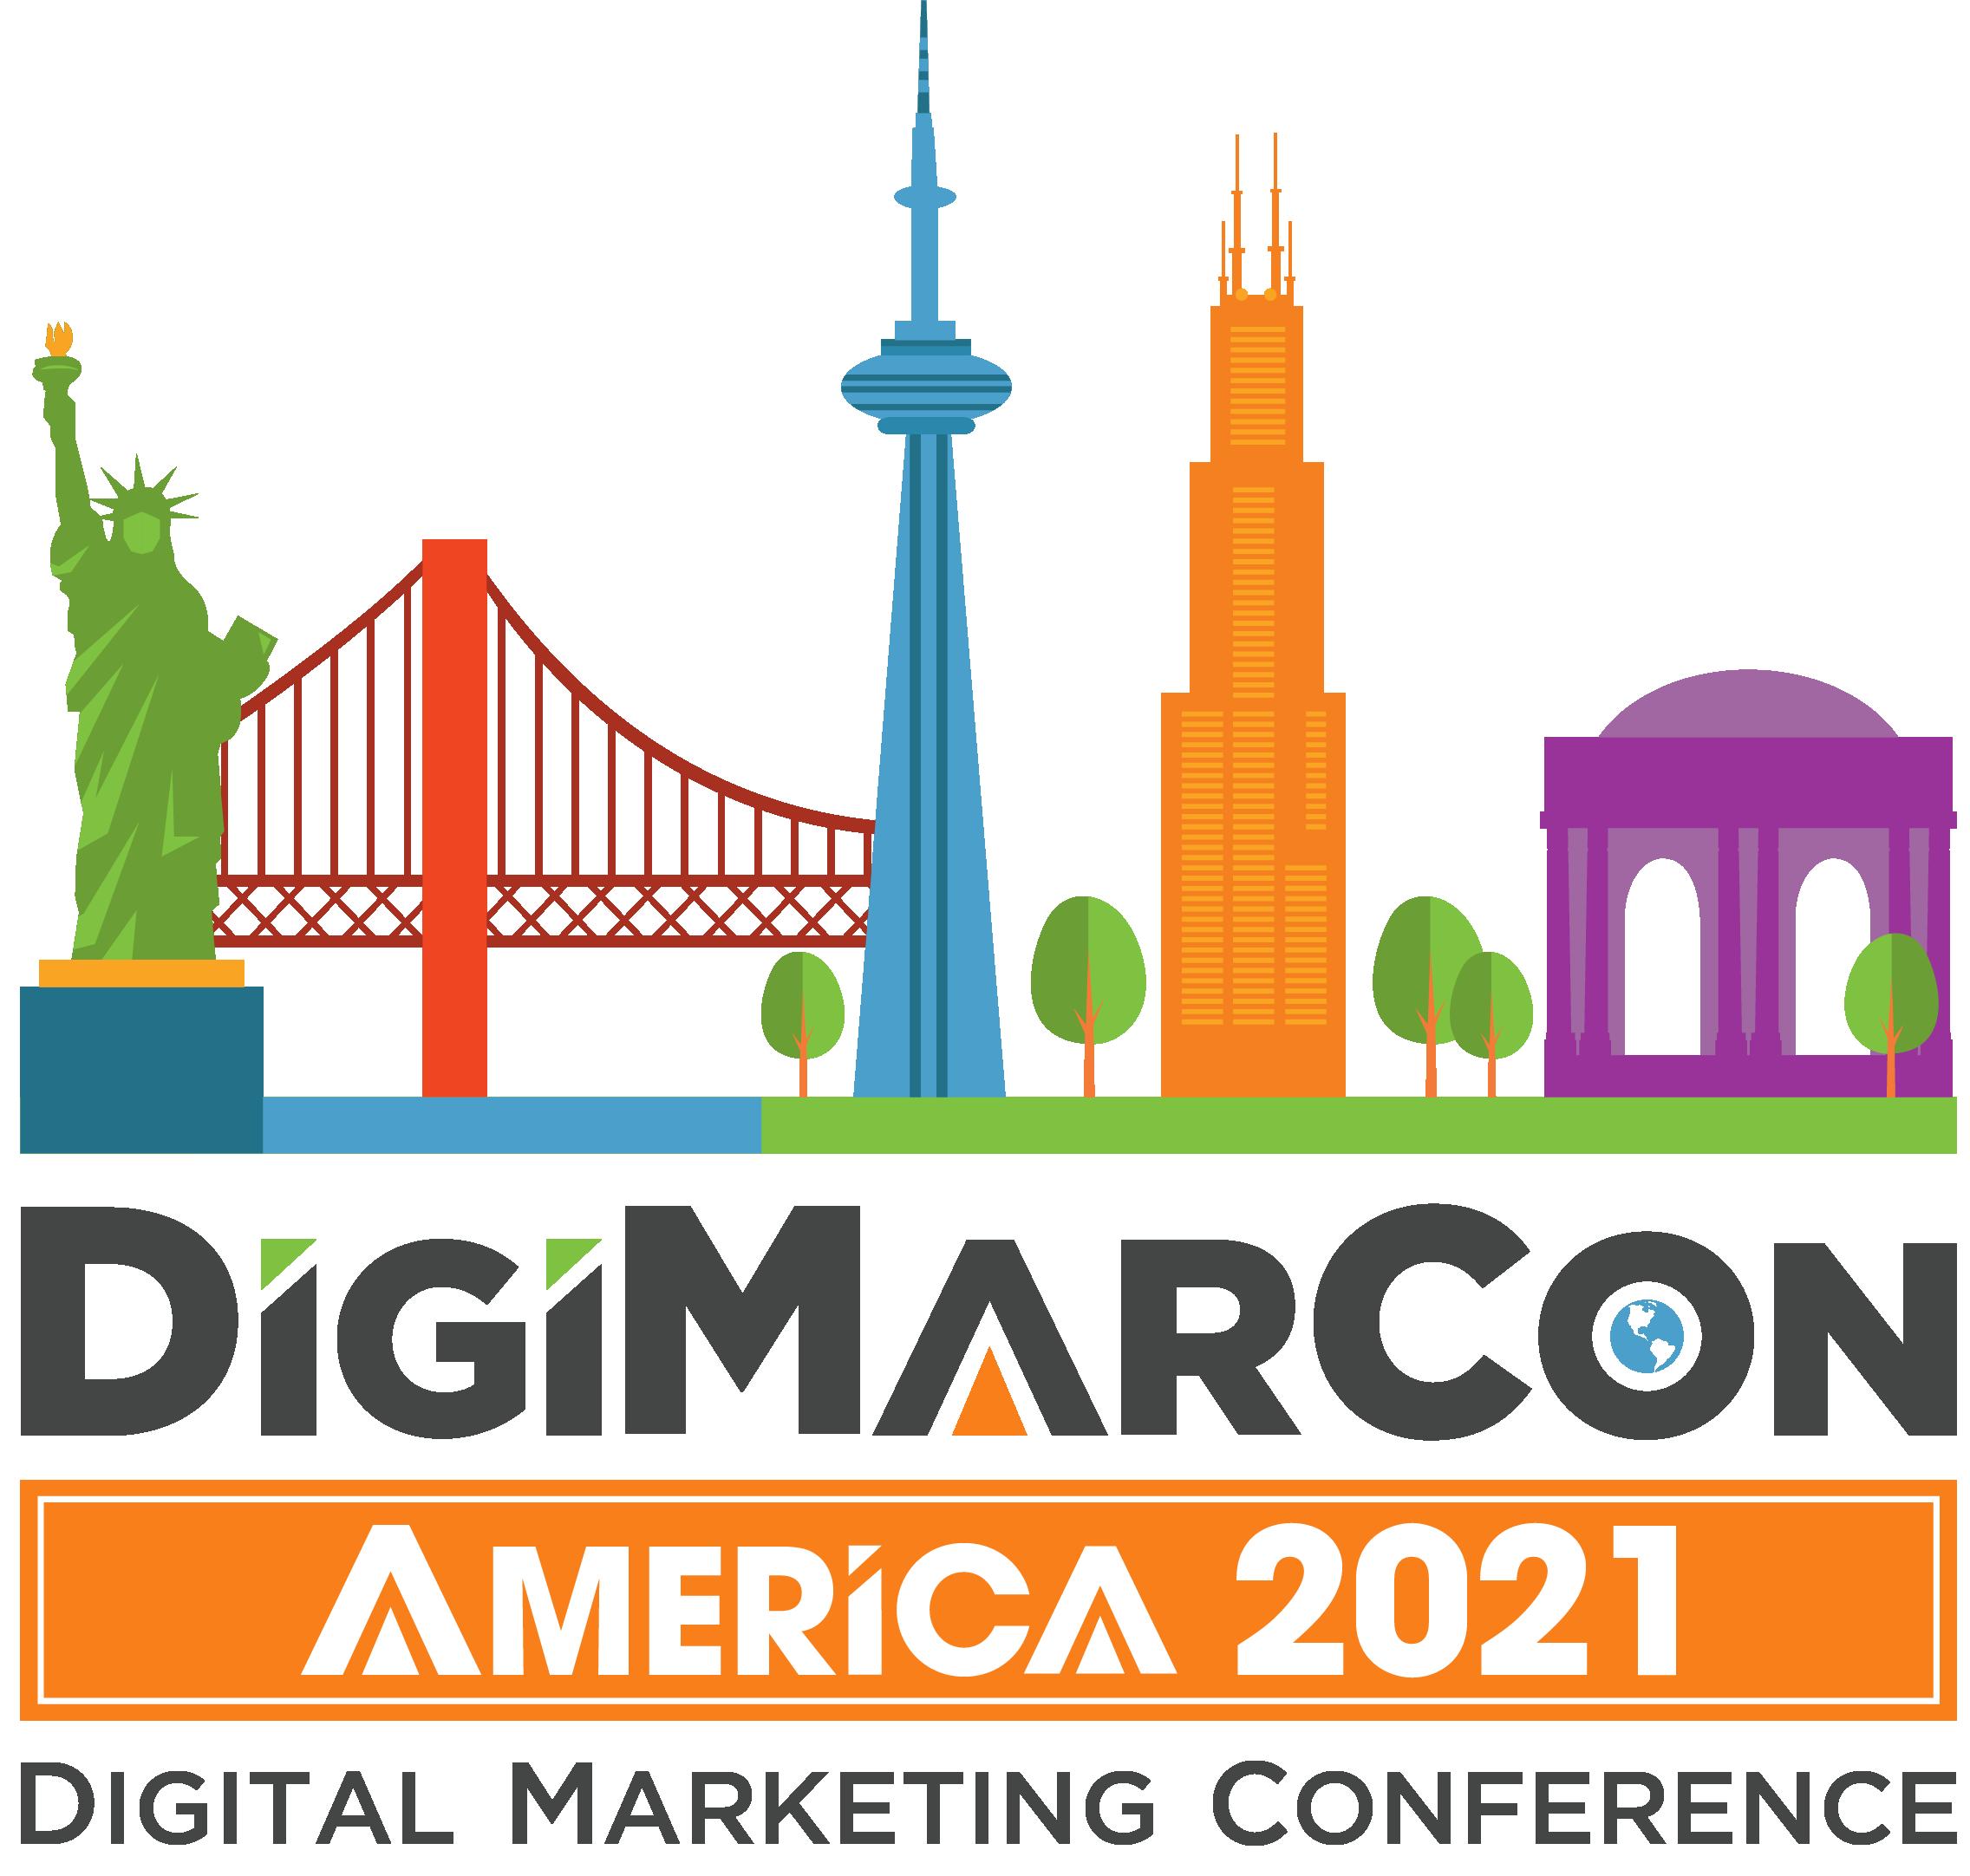 DigiMarCon America